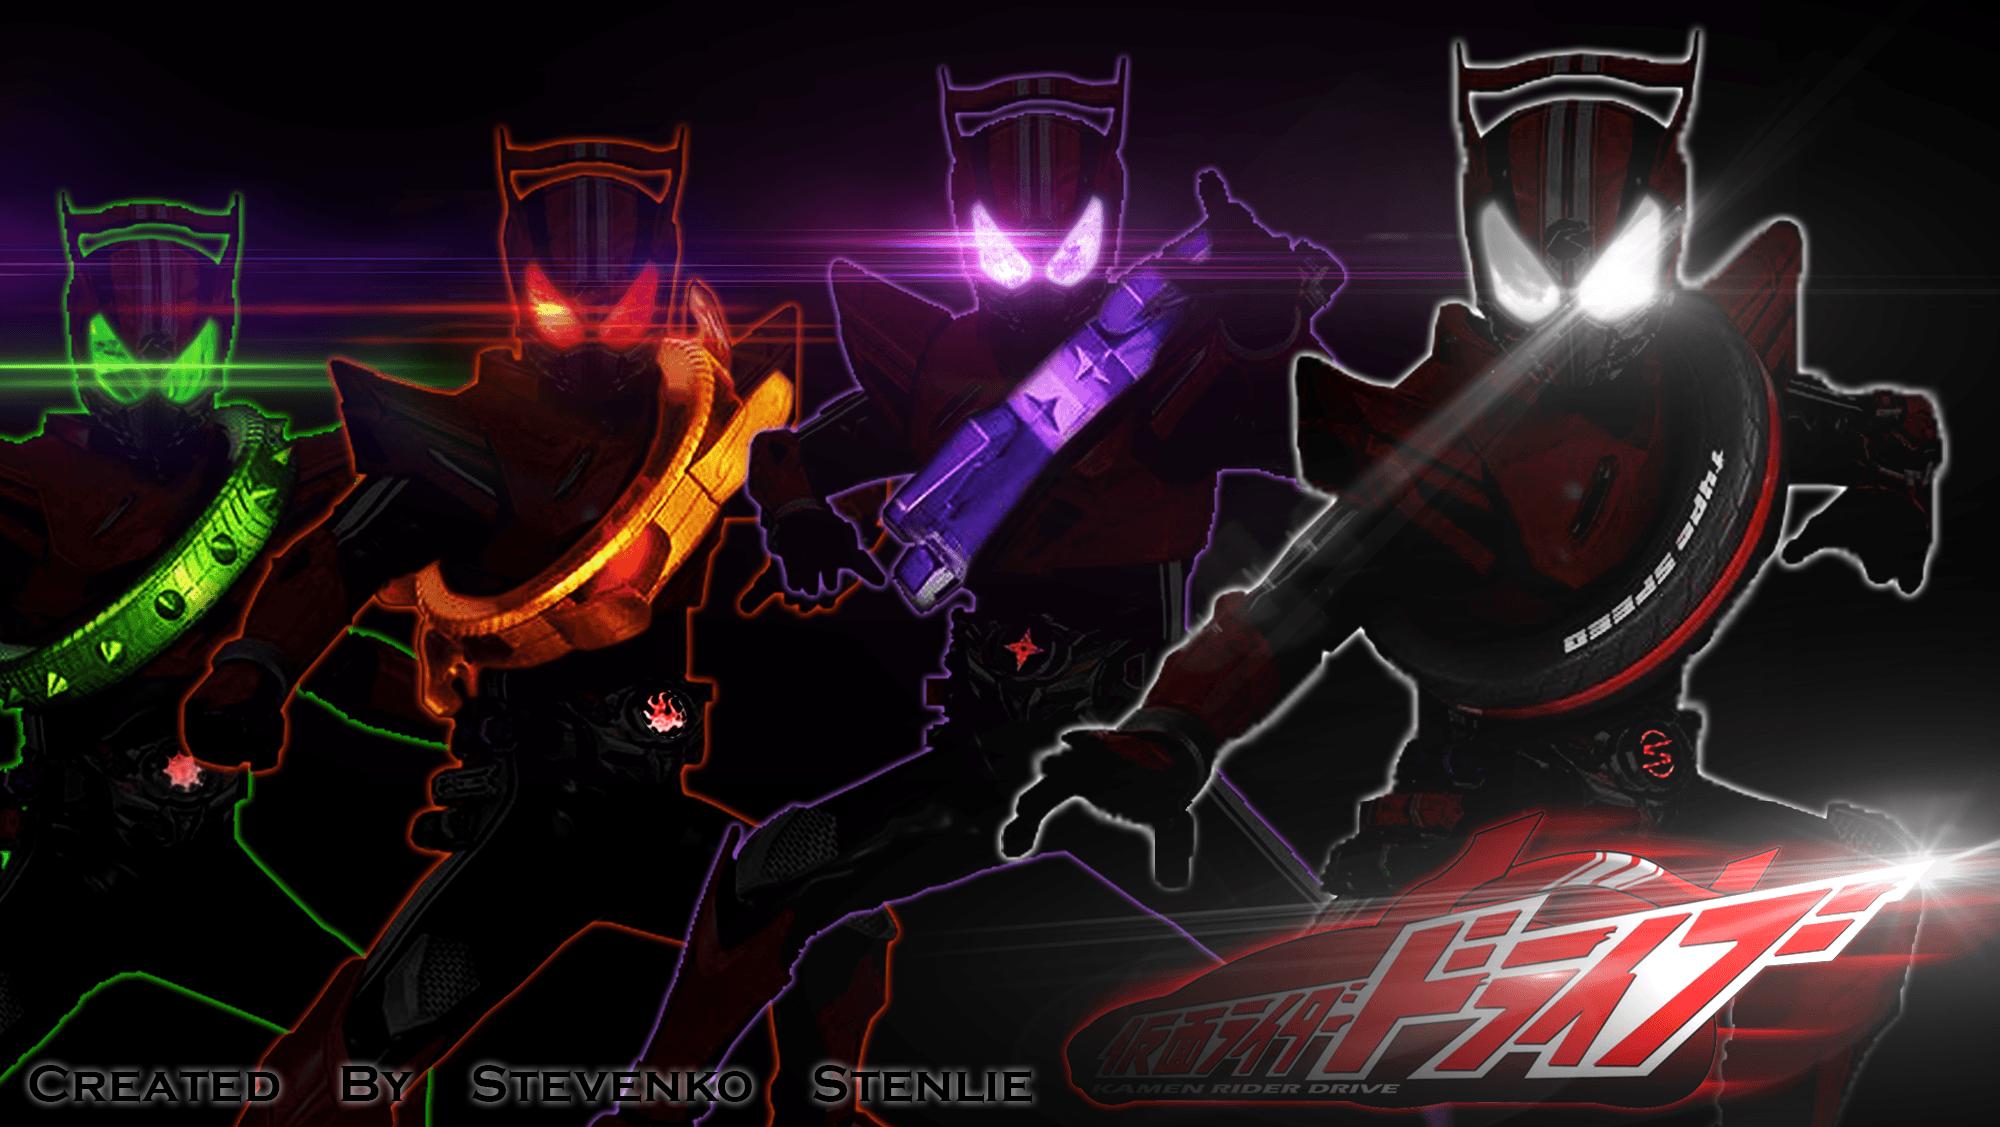 Kamen Rider Wallpapers - Wallpaper Cave